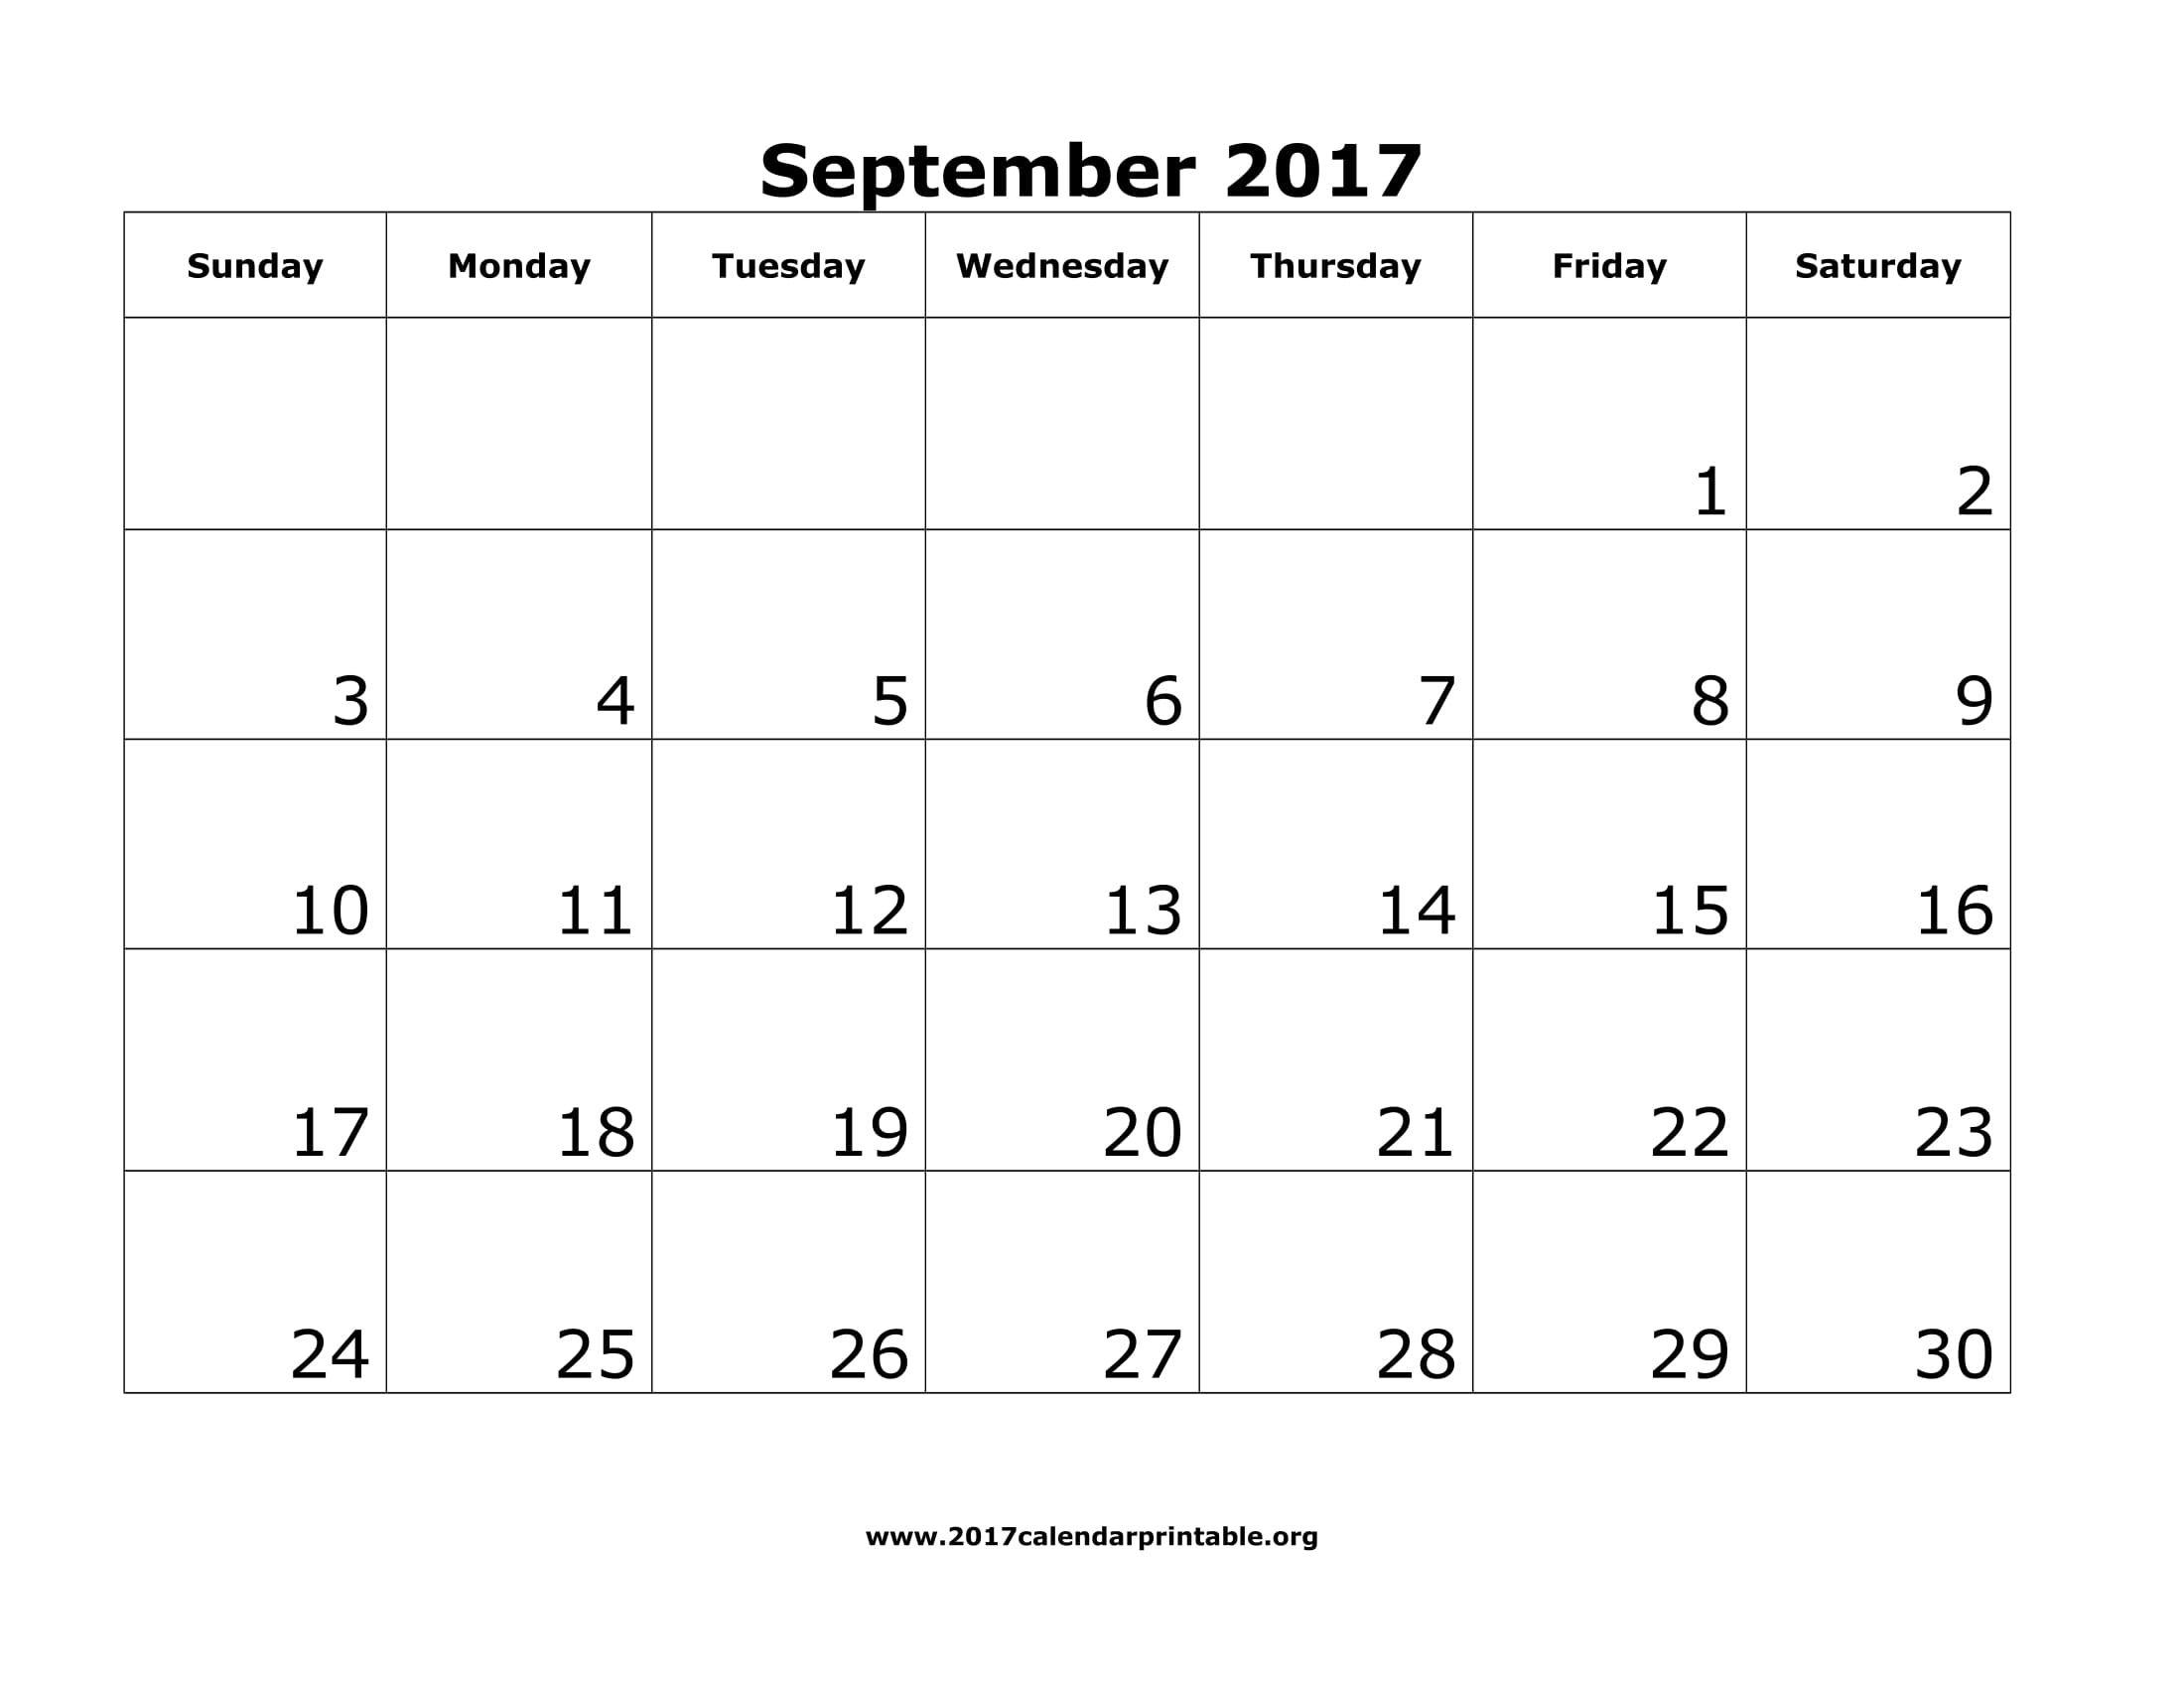 Download September 2017 Calendar Printable with federal holidays ...